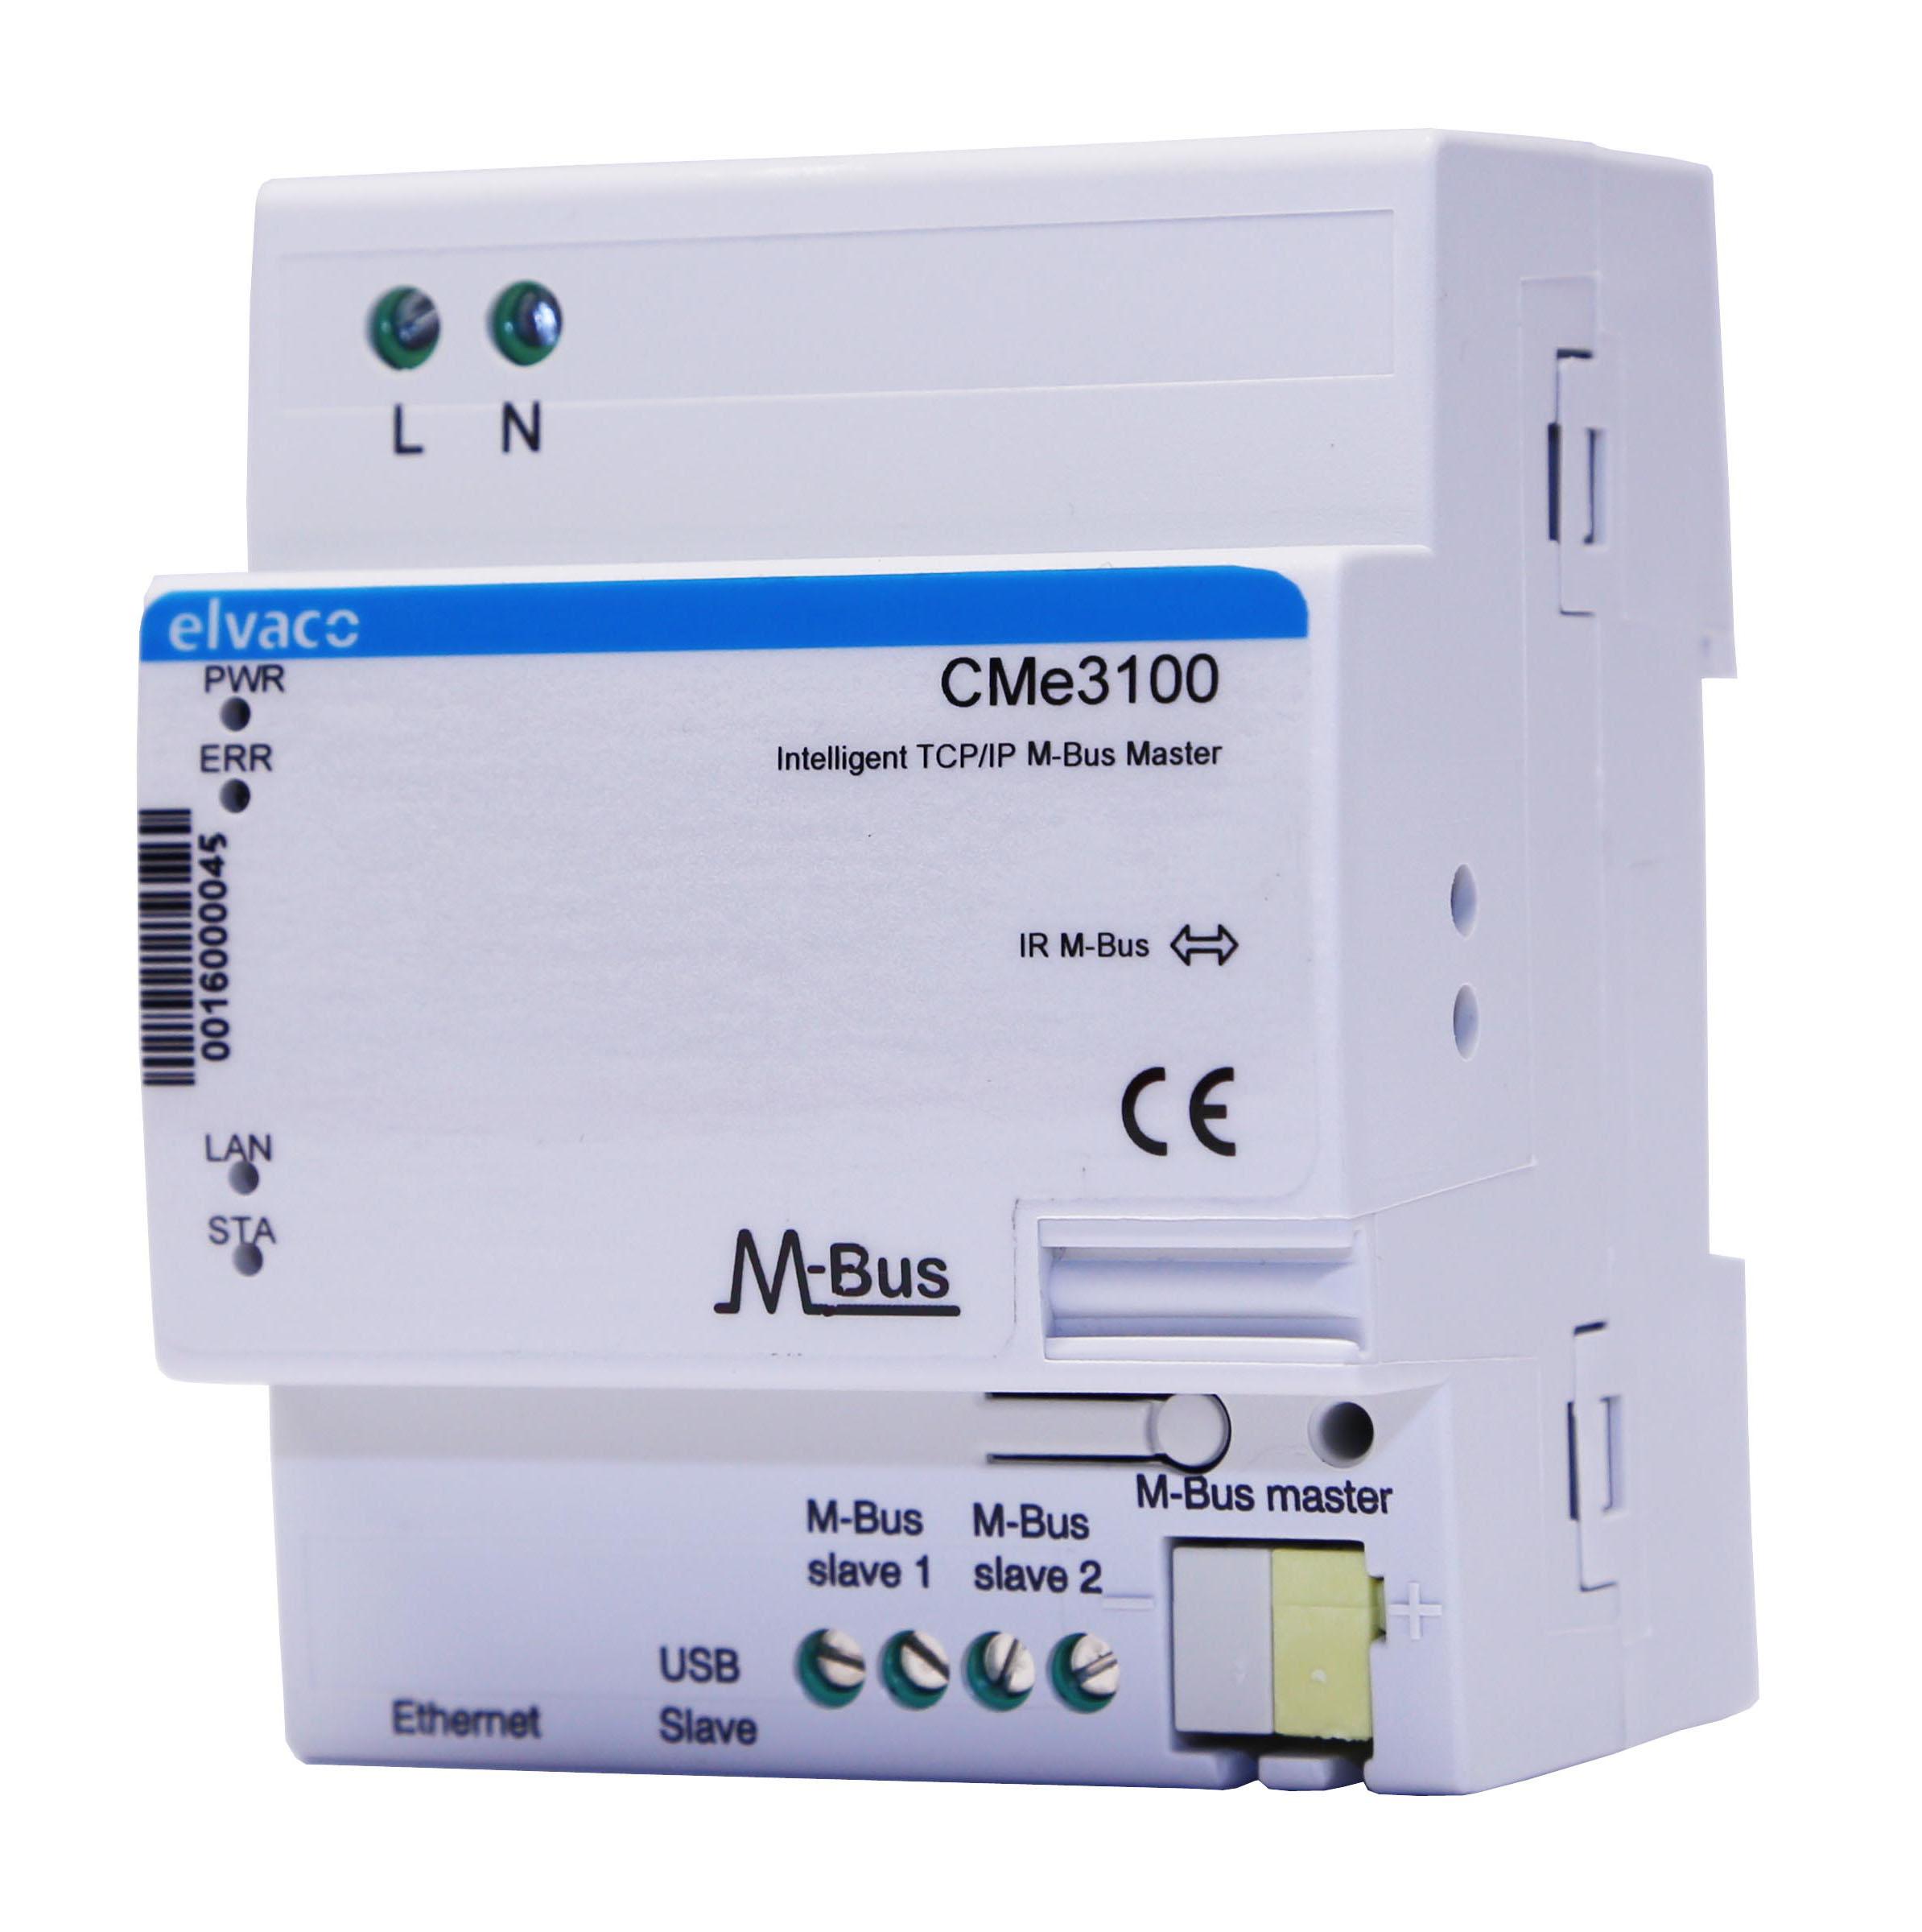 Software Systemtechnik - ICM Technologies GmbH